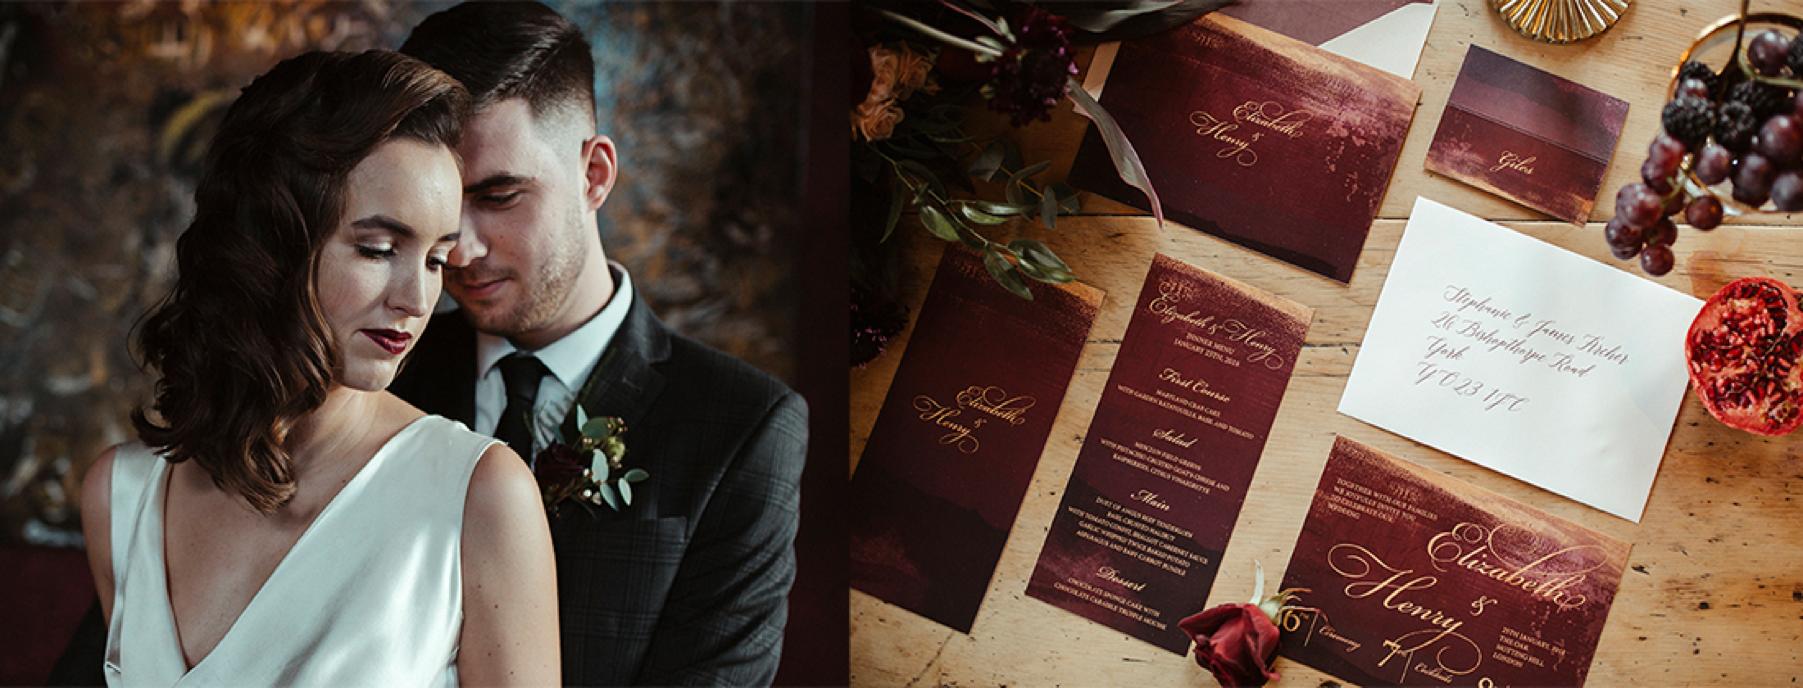 Claret and gold wedding invitation, regal wedding, sumptuous wedding, red and gold, winter wedding, autumn wedding